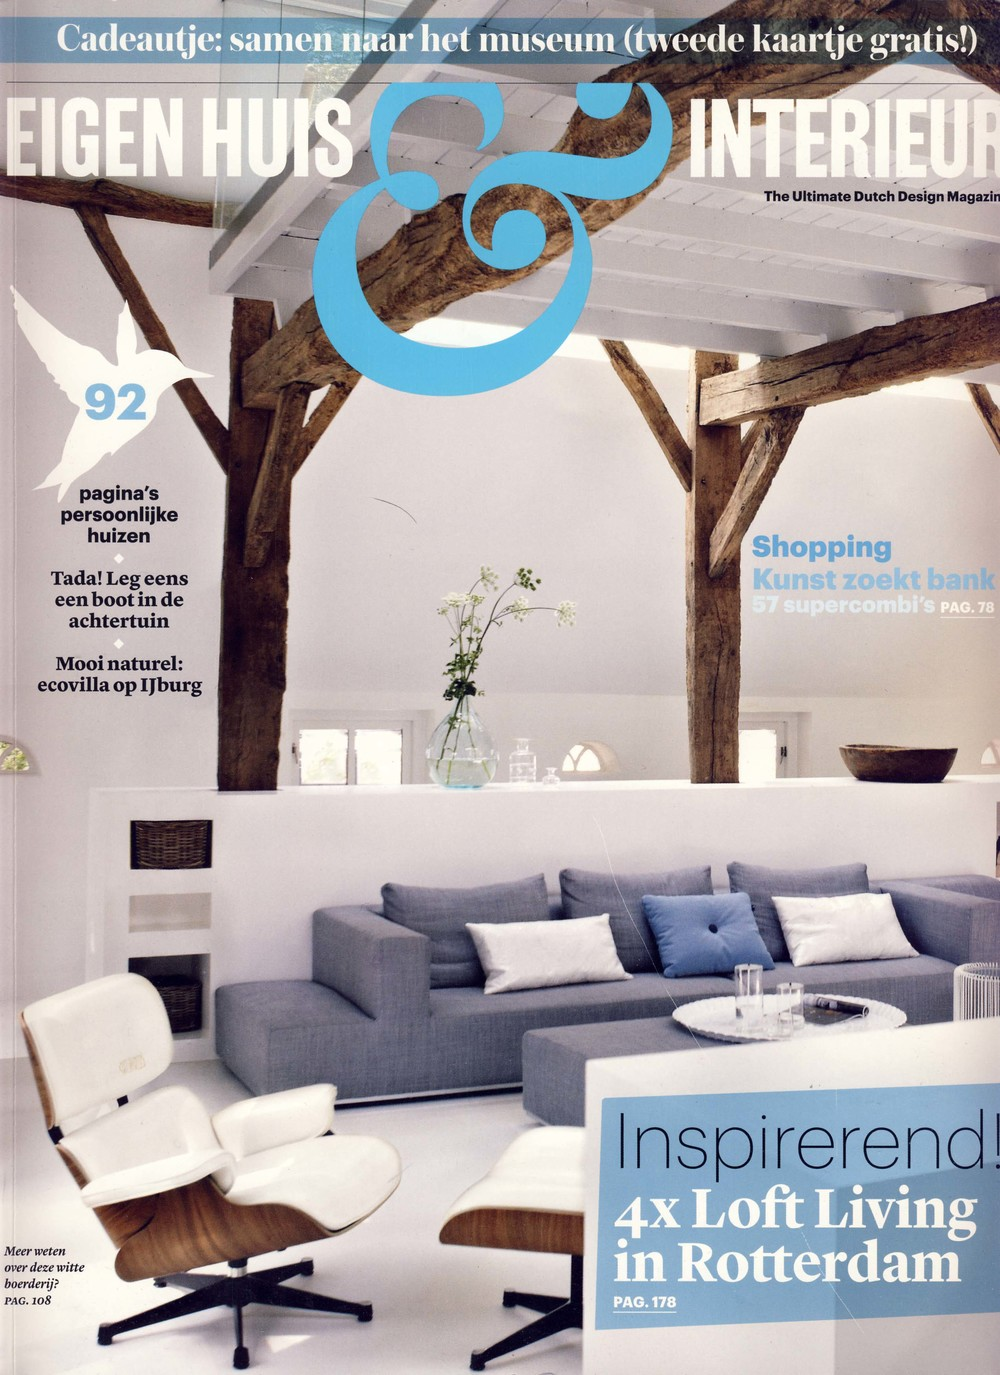 web_eigen huis_interieur_cover.jpg